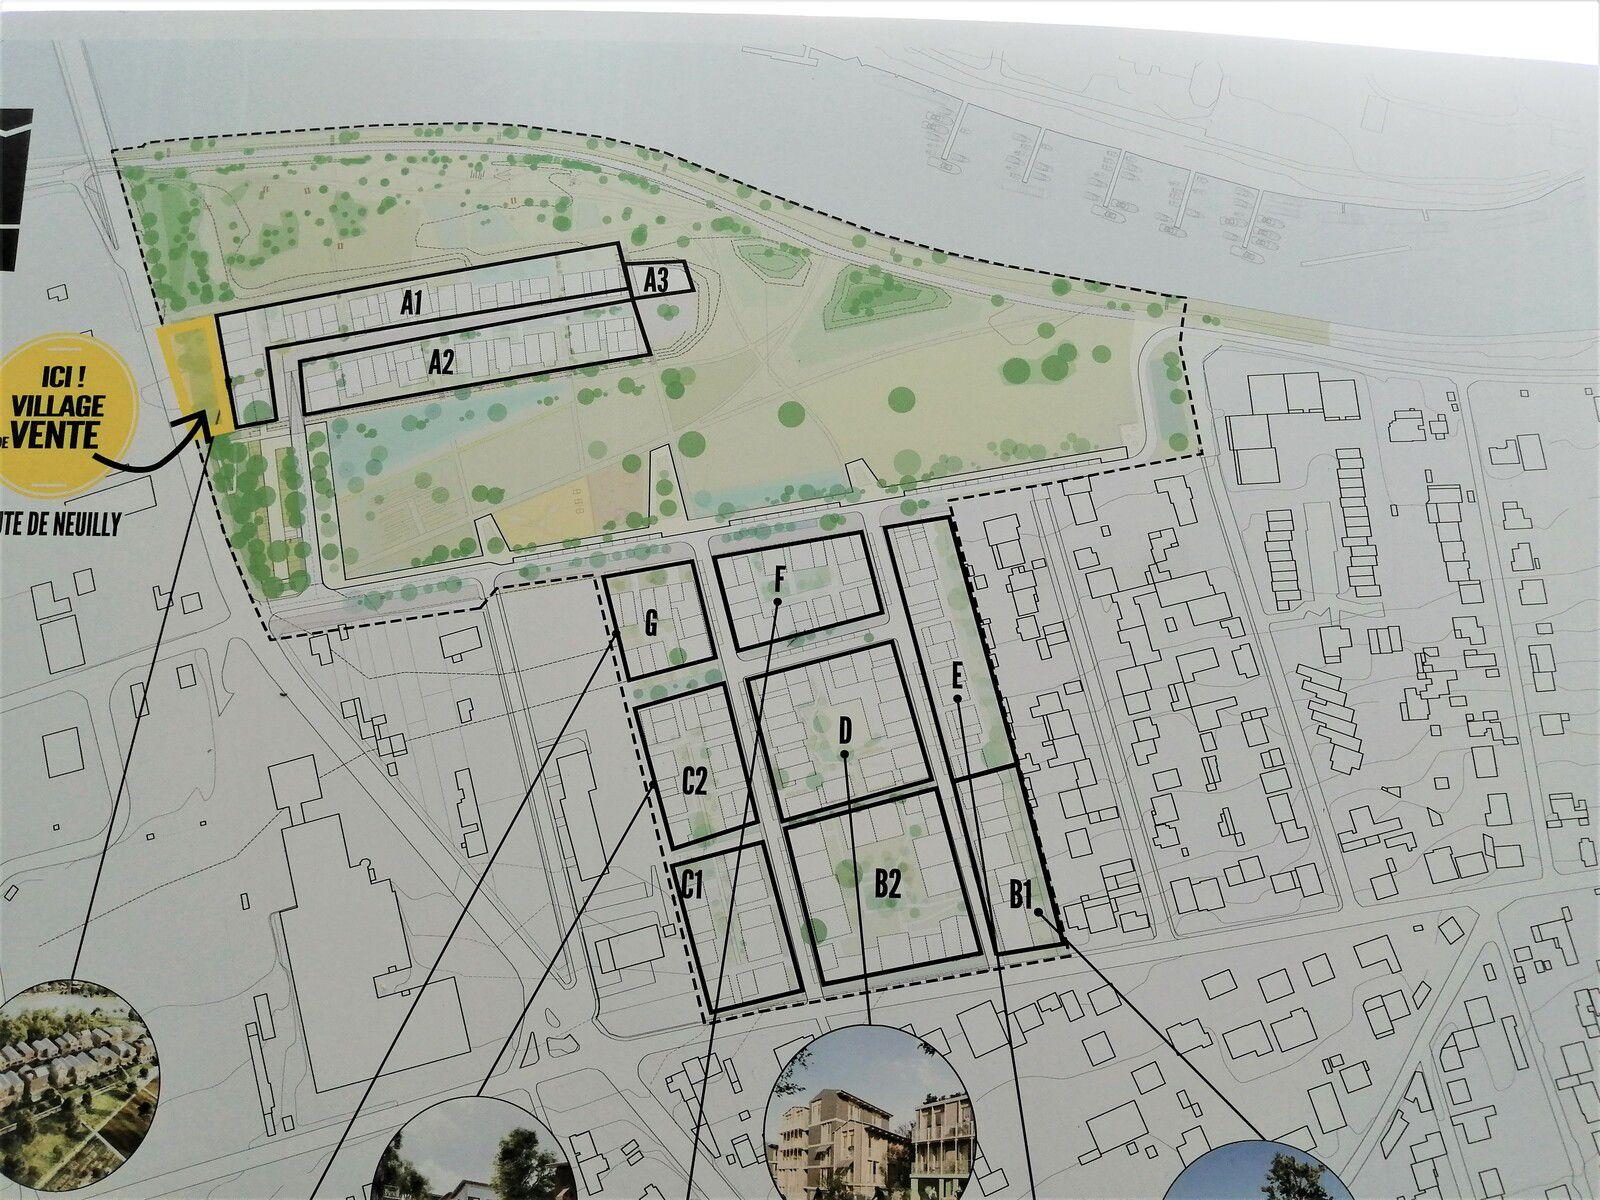 Eco-quartier/Bords de Marne : comment circuler ?